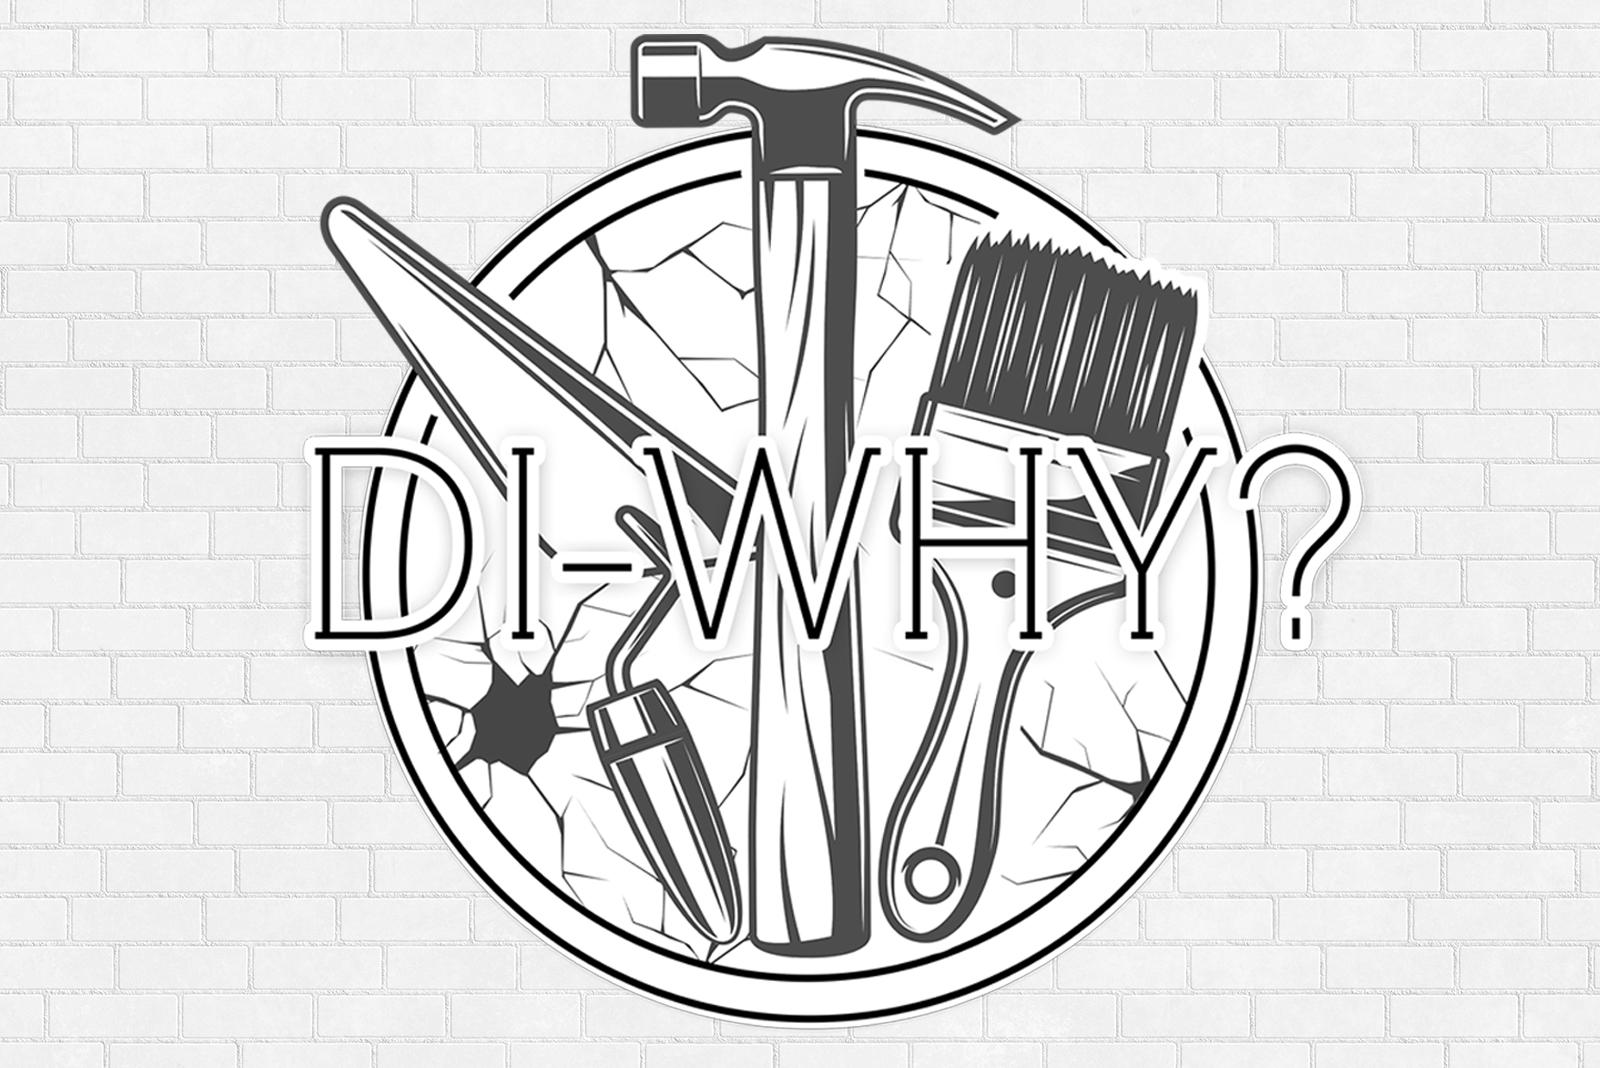 DI-WHY? 27th November 2019